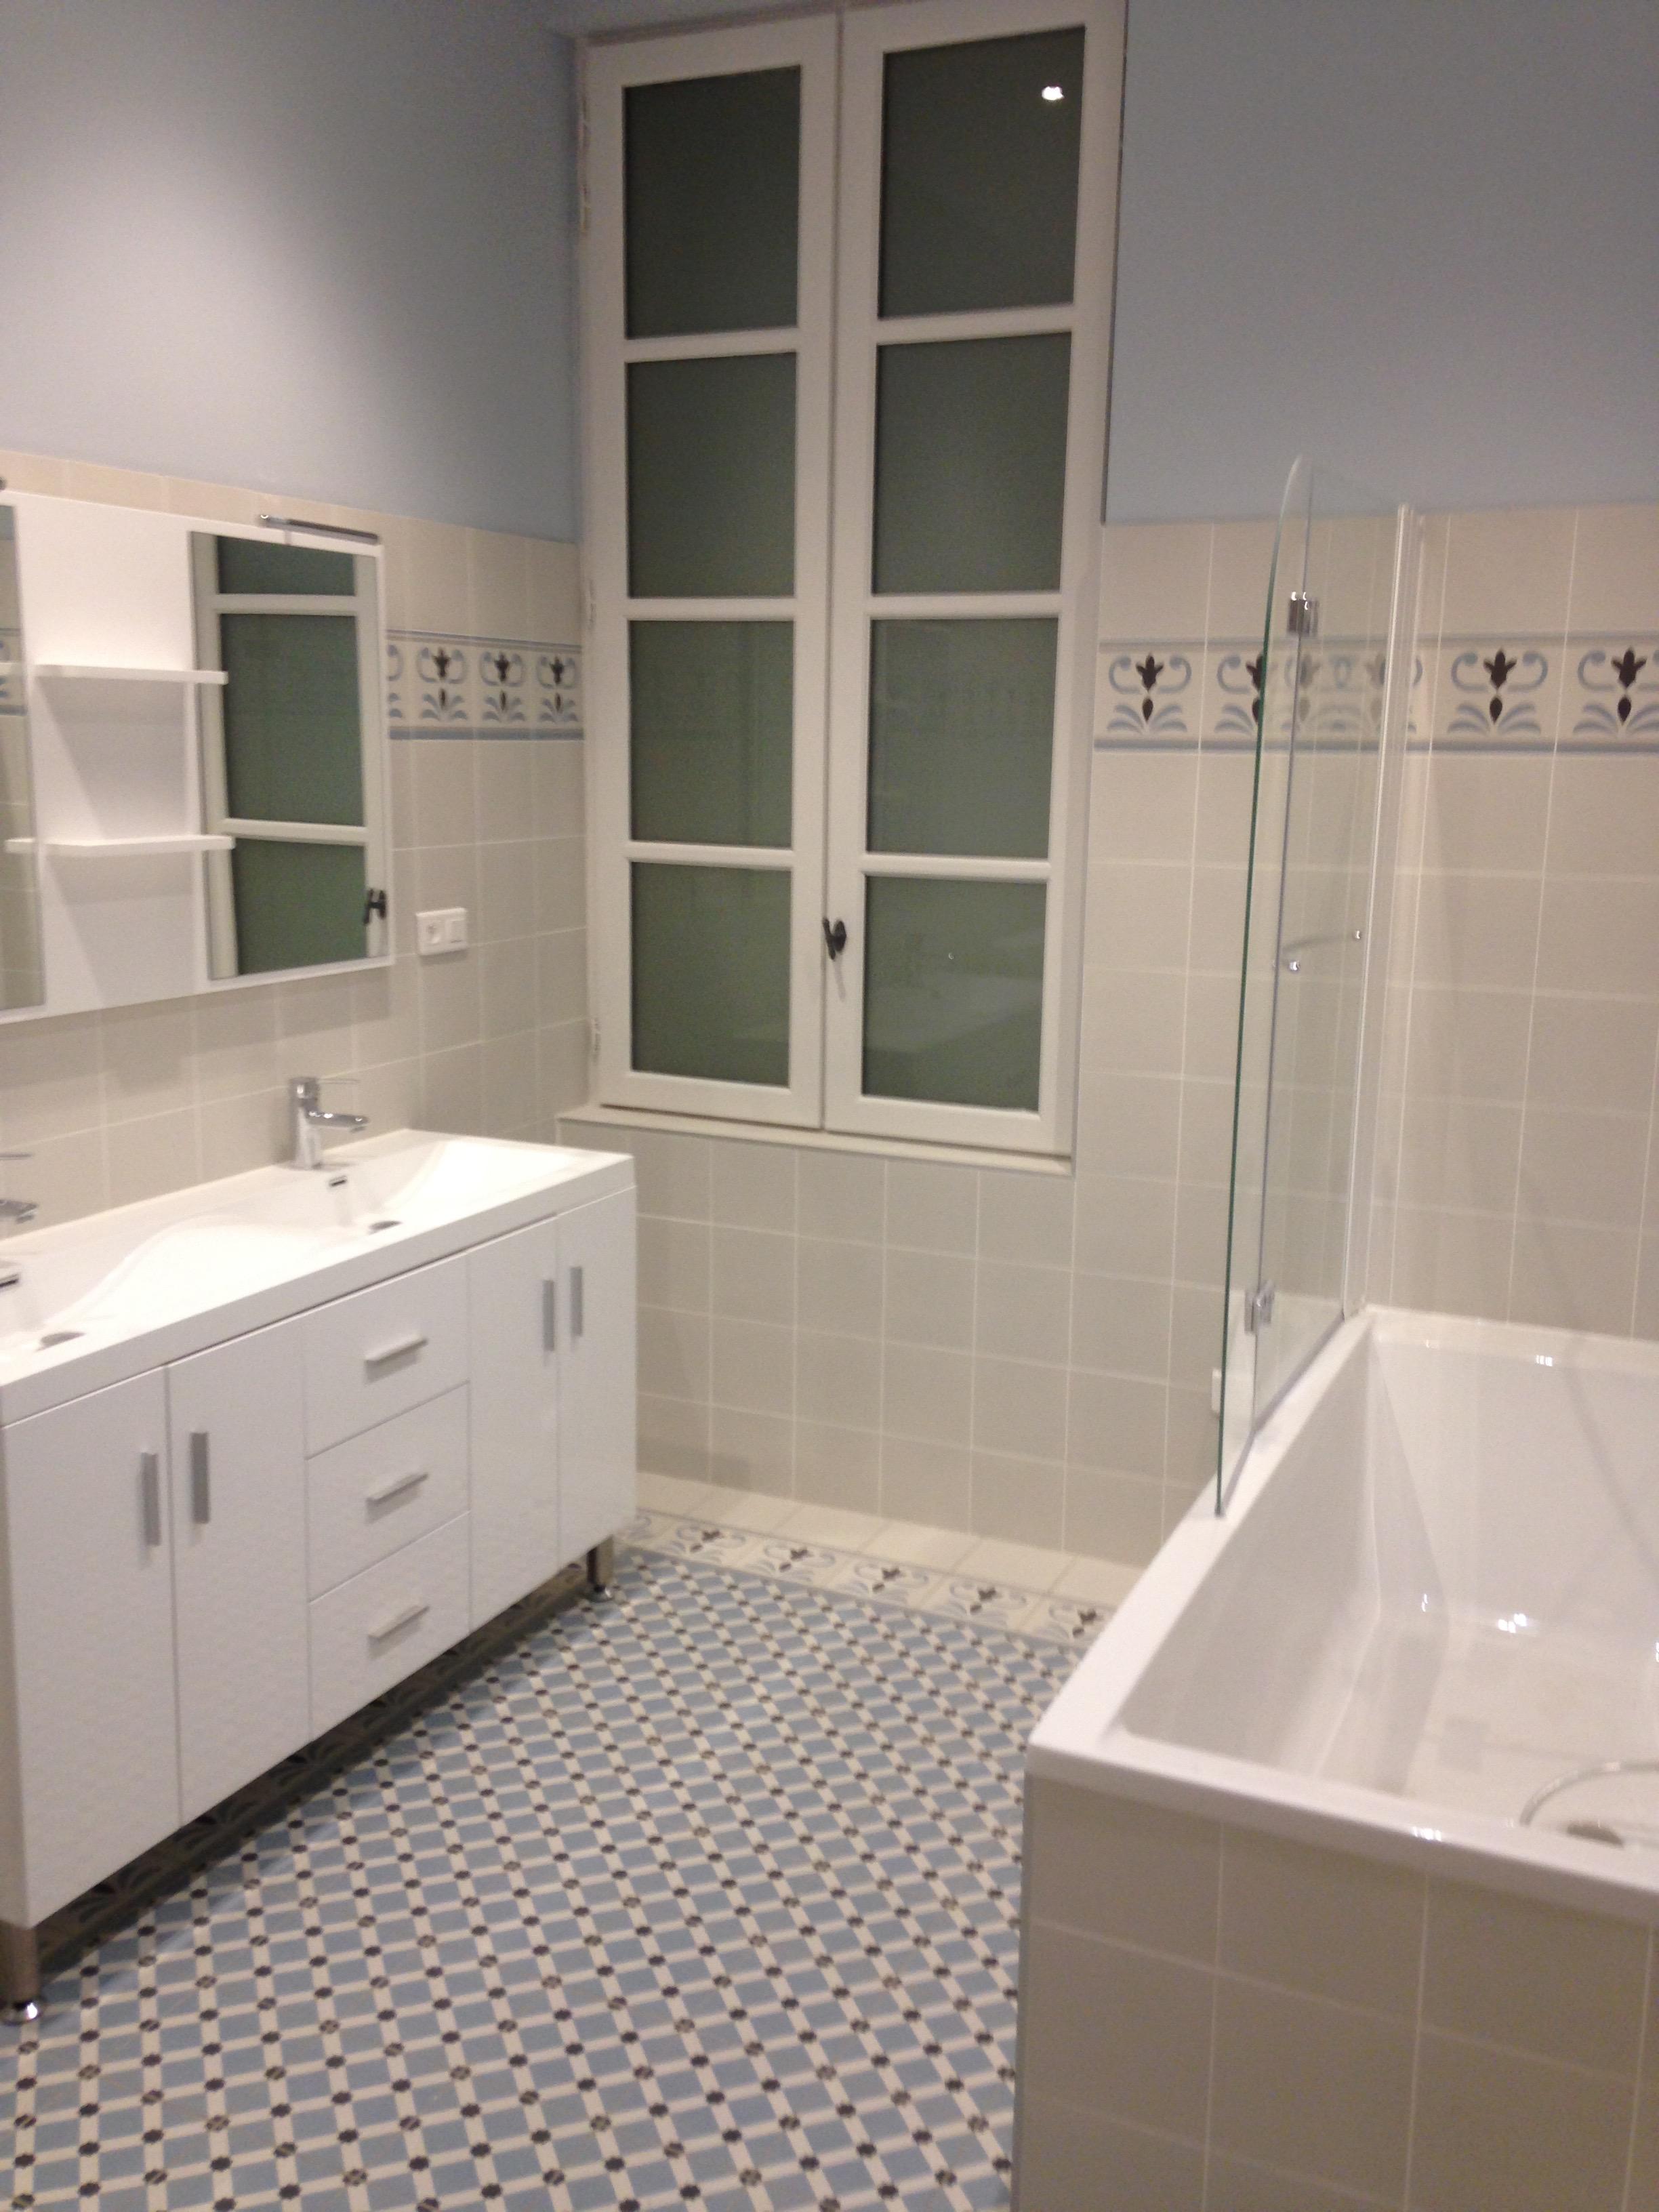 Salle De Bain Carreau De Ciment Beige ~ salle de bain type carreaux de ciment entreprise salle de bain